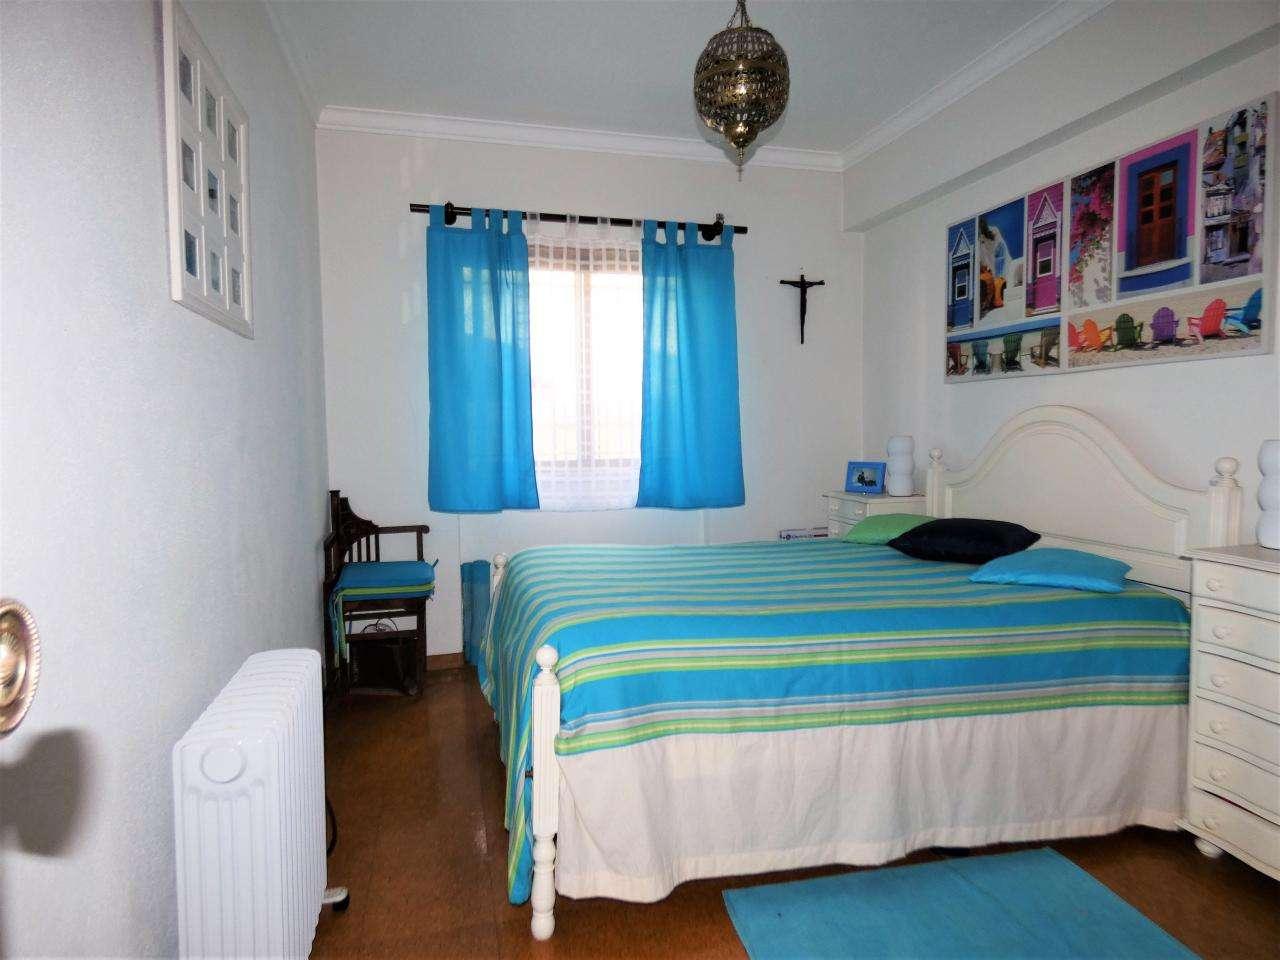 Apartamento para comprar, Ericeira, Mafra, Lisboa - Foto 12